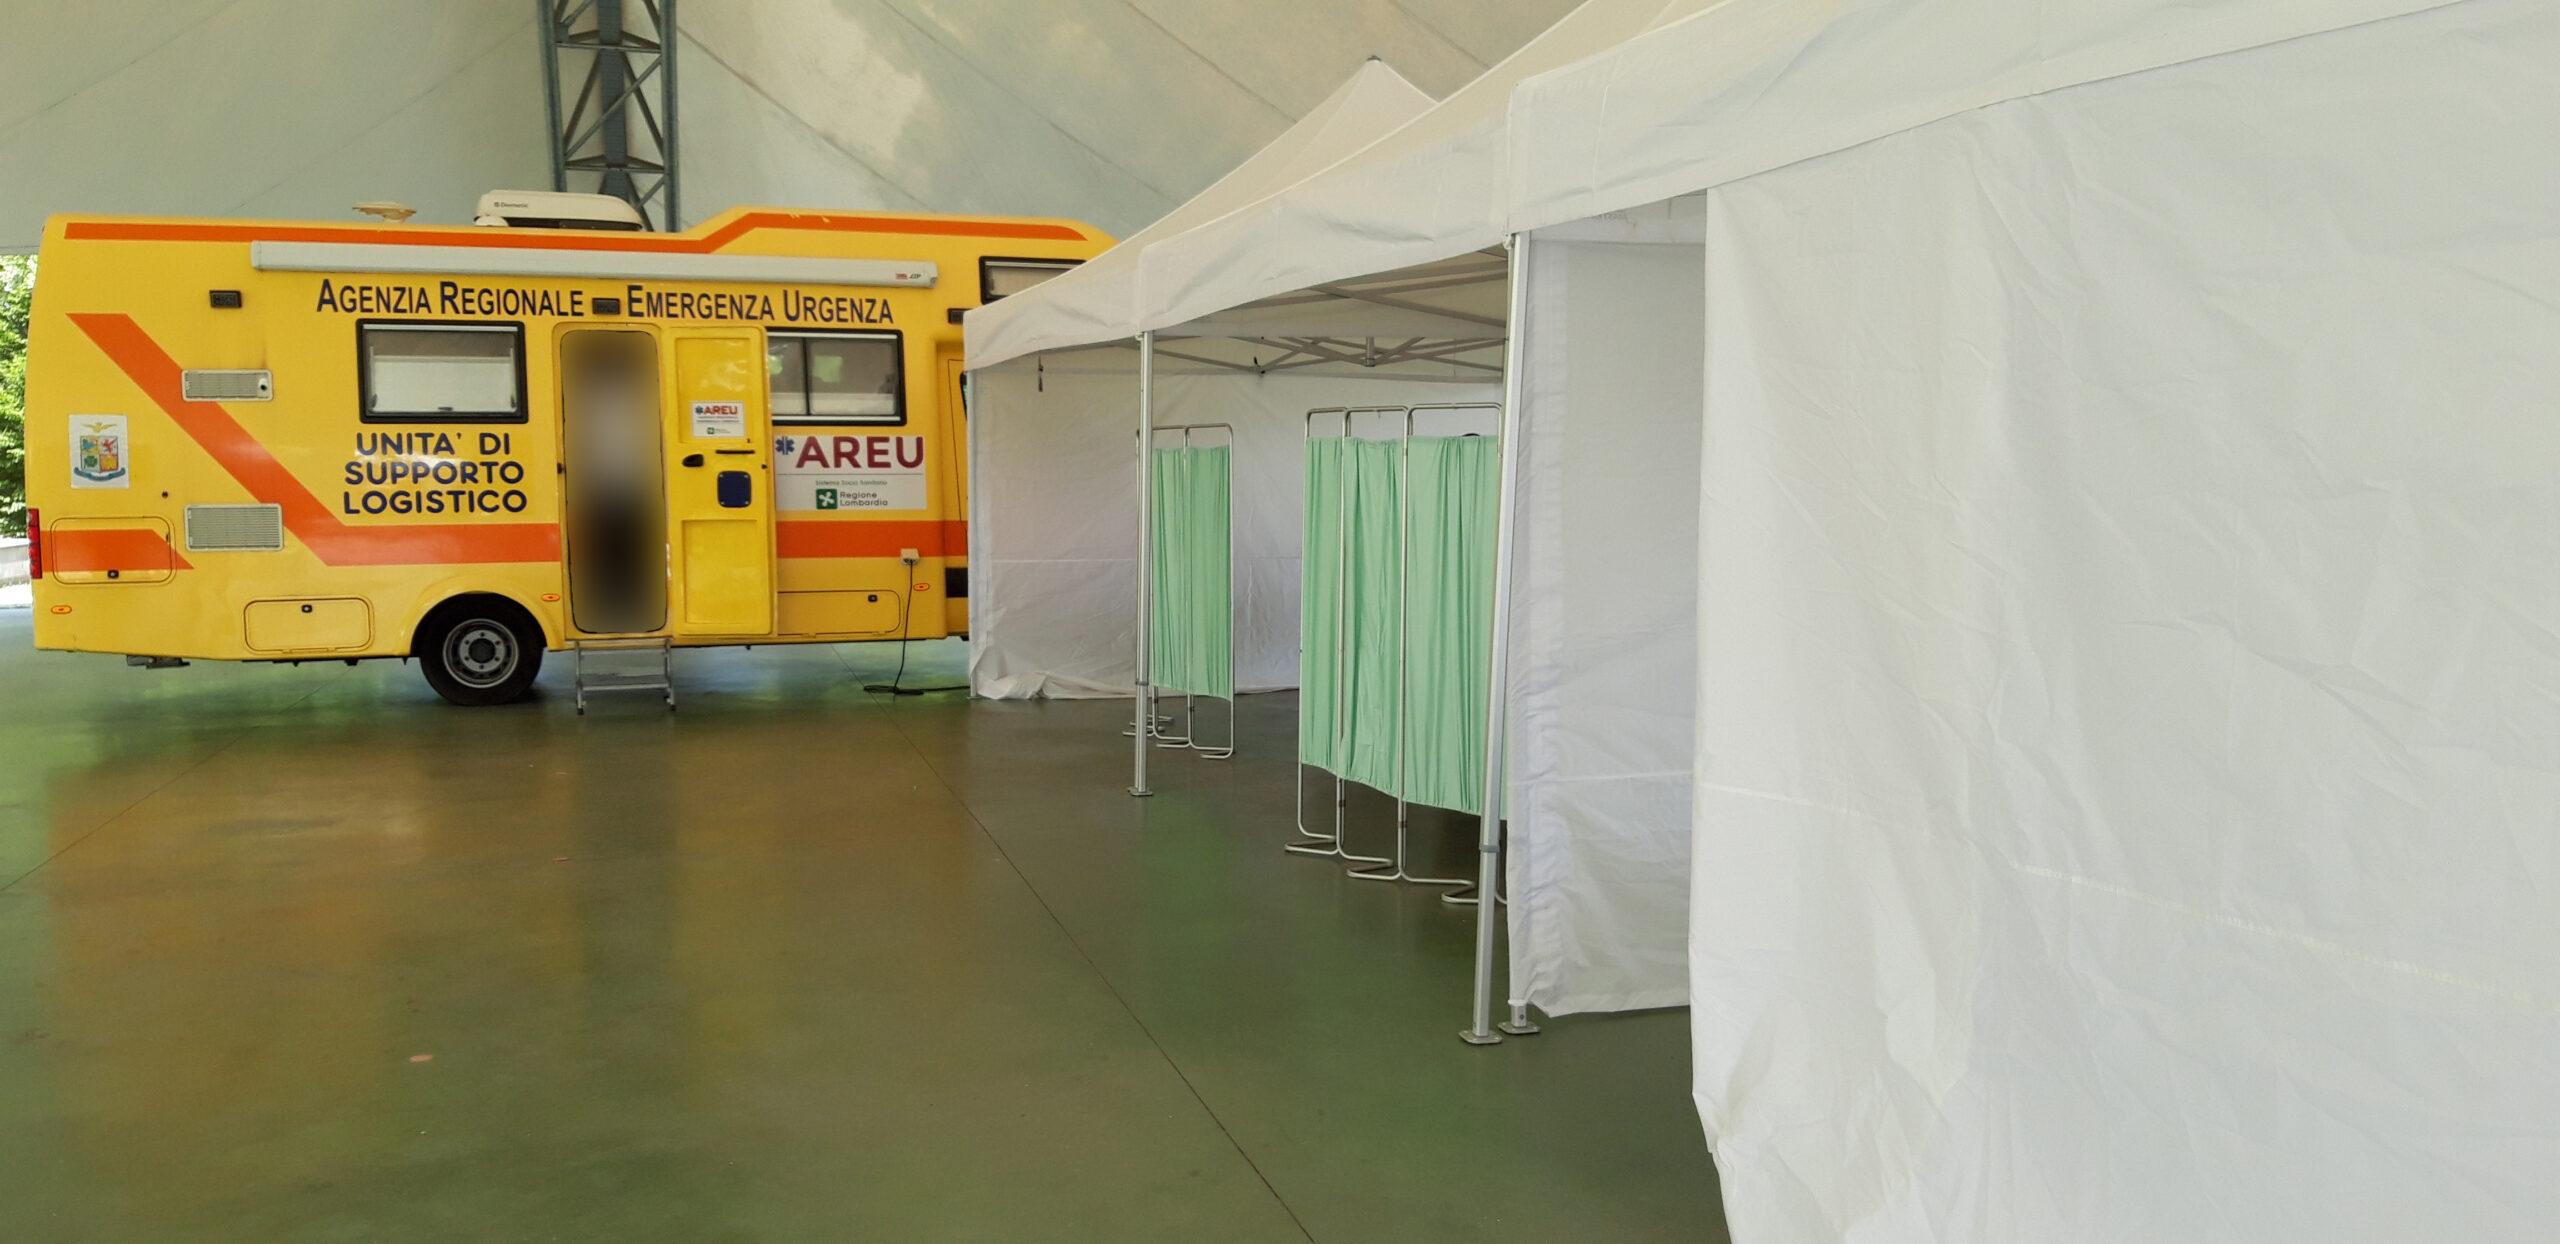 unità vaccinale mobile areu (3)